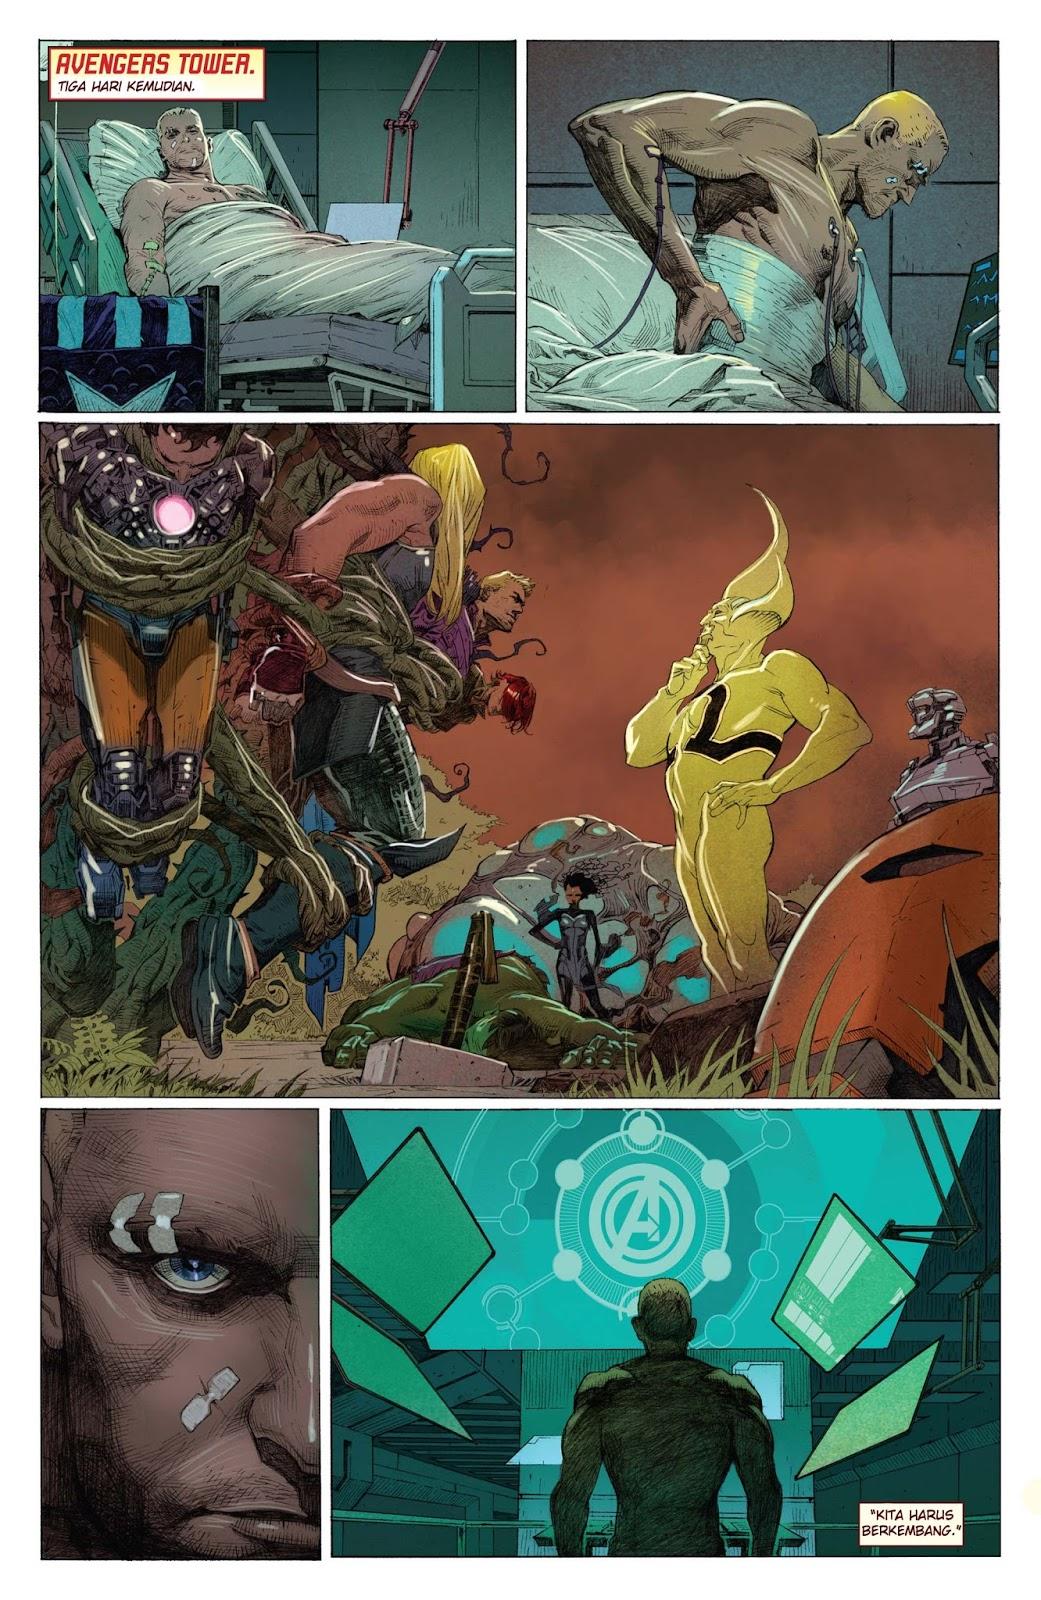 komik the avengers 1 2012  komik pos  baca komik